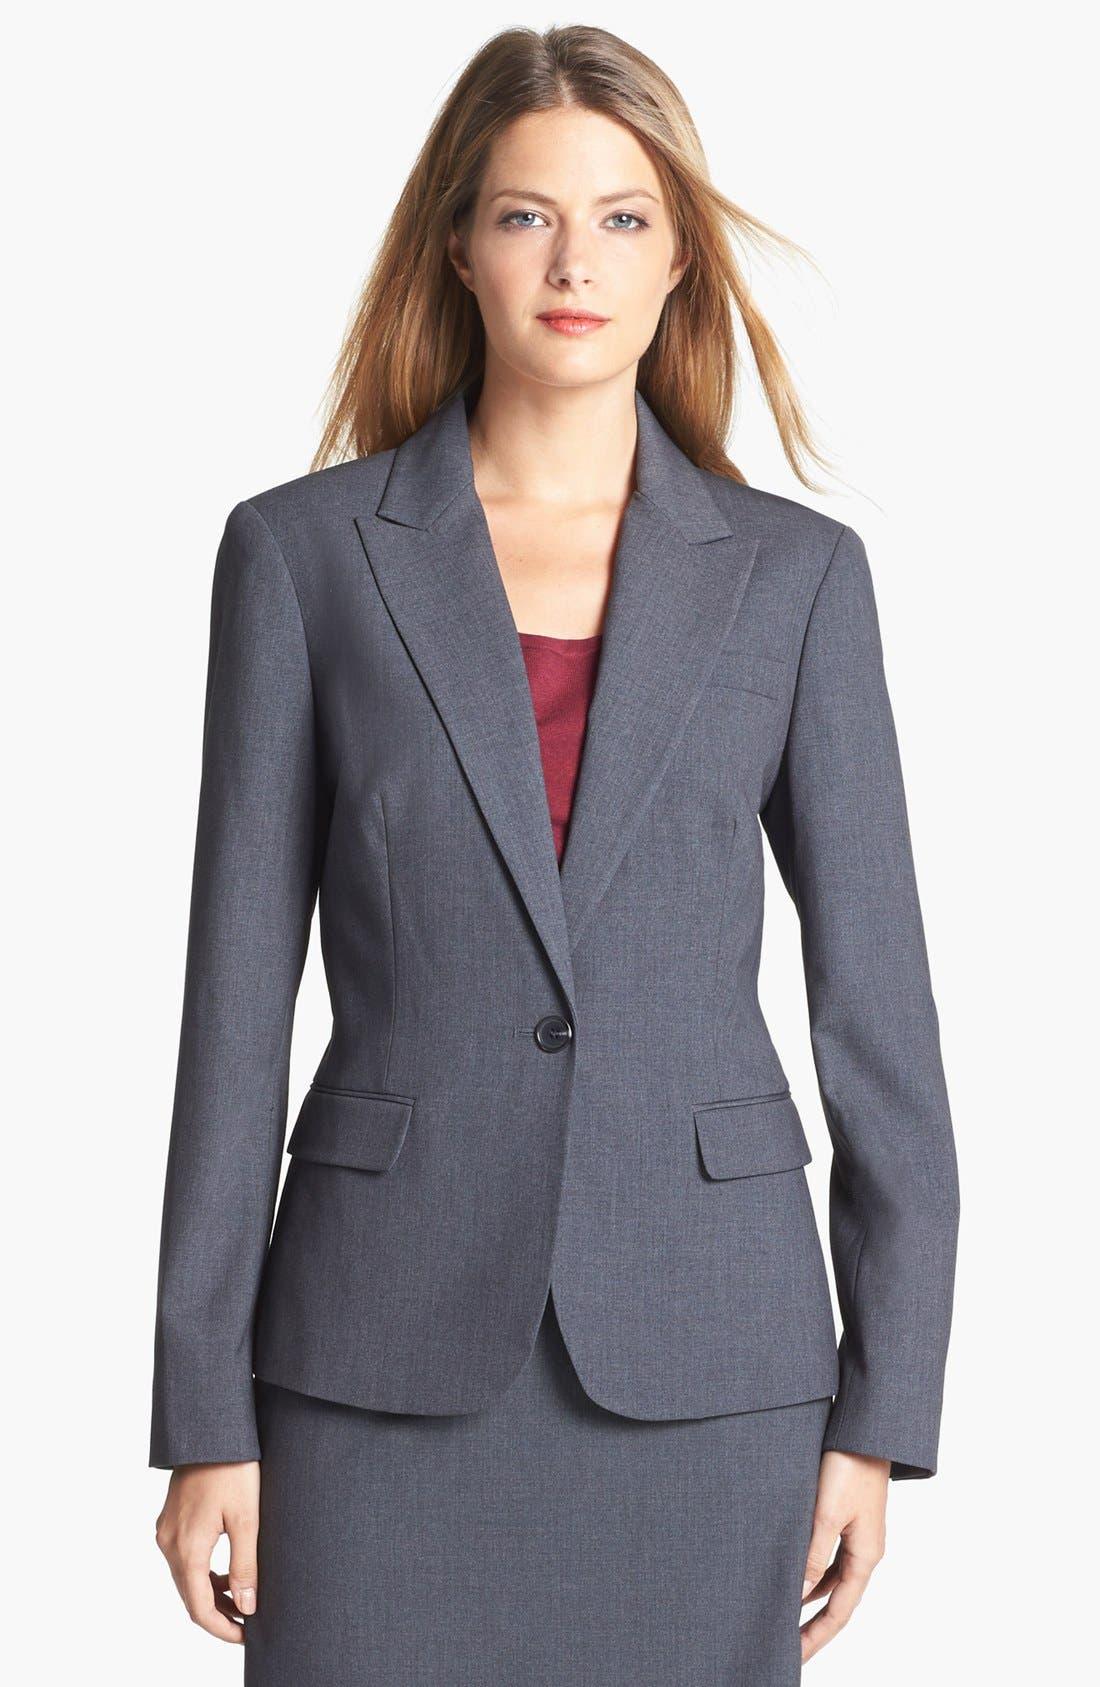 Alternate Image 1 Selected - Jones New York 'Julia' Single Button Jacket